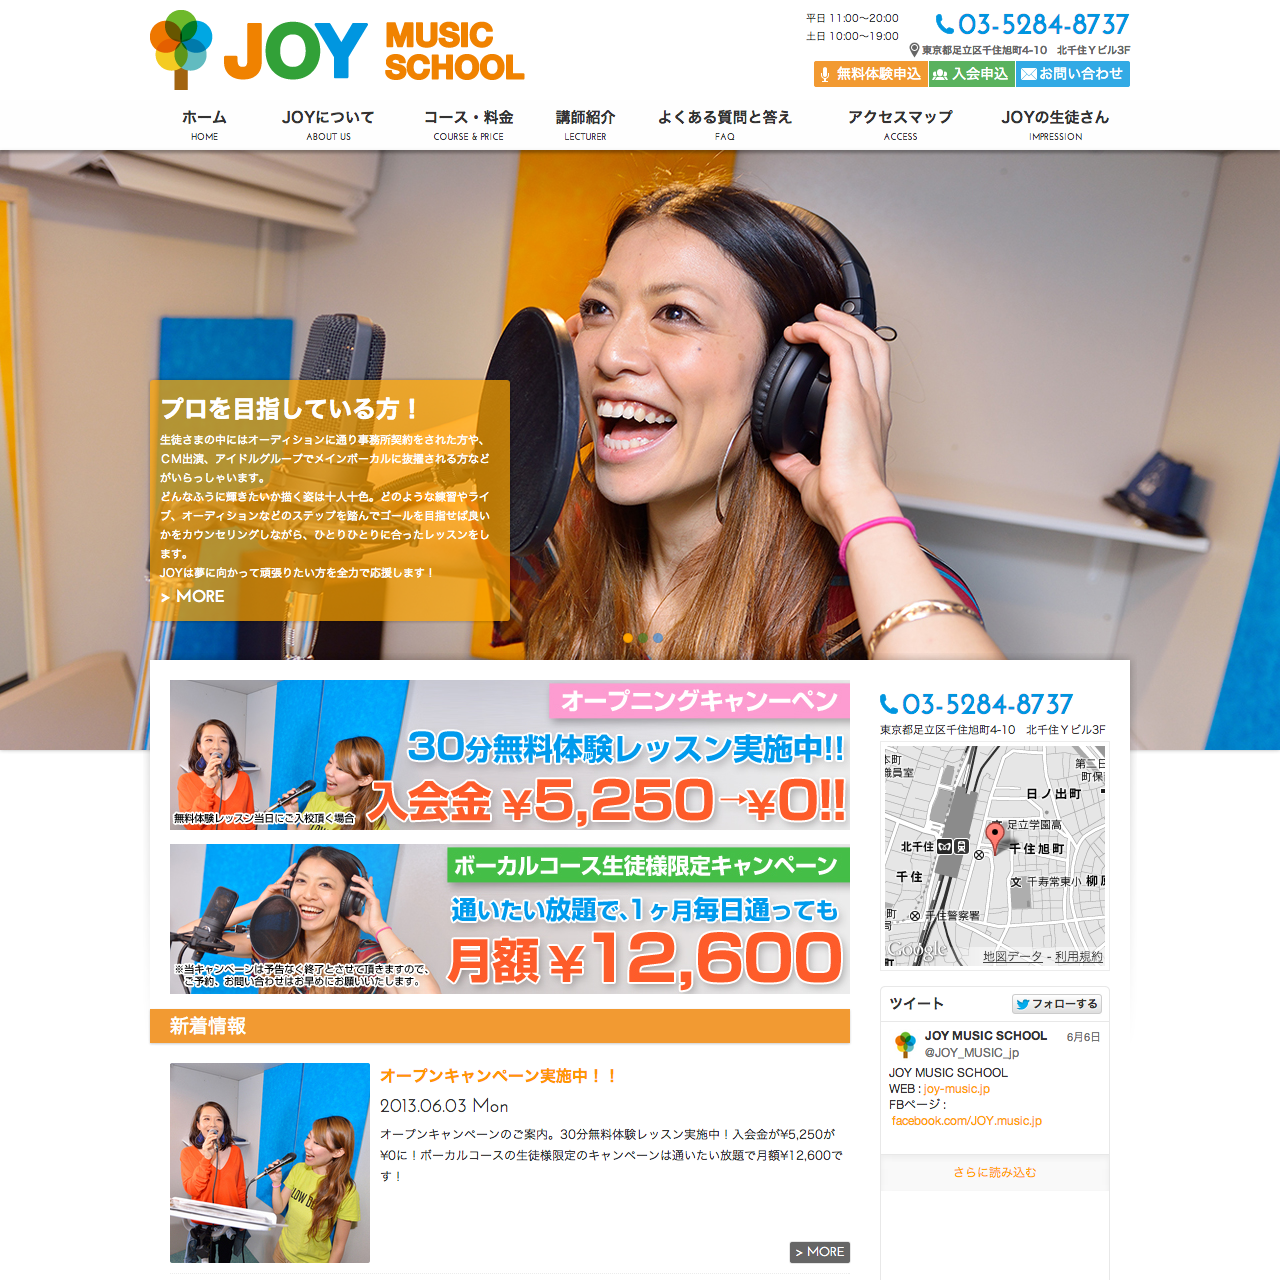 joy_01.png